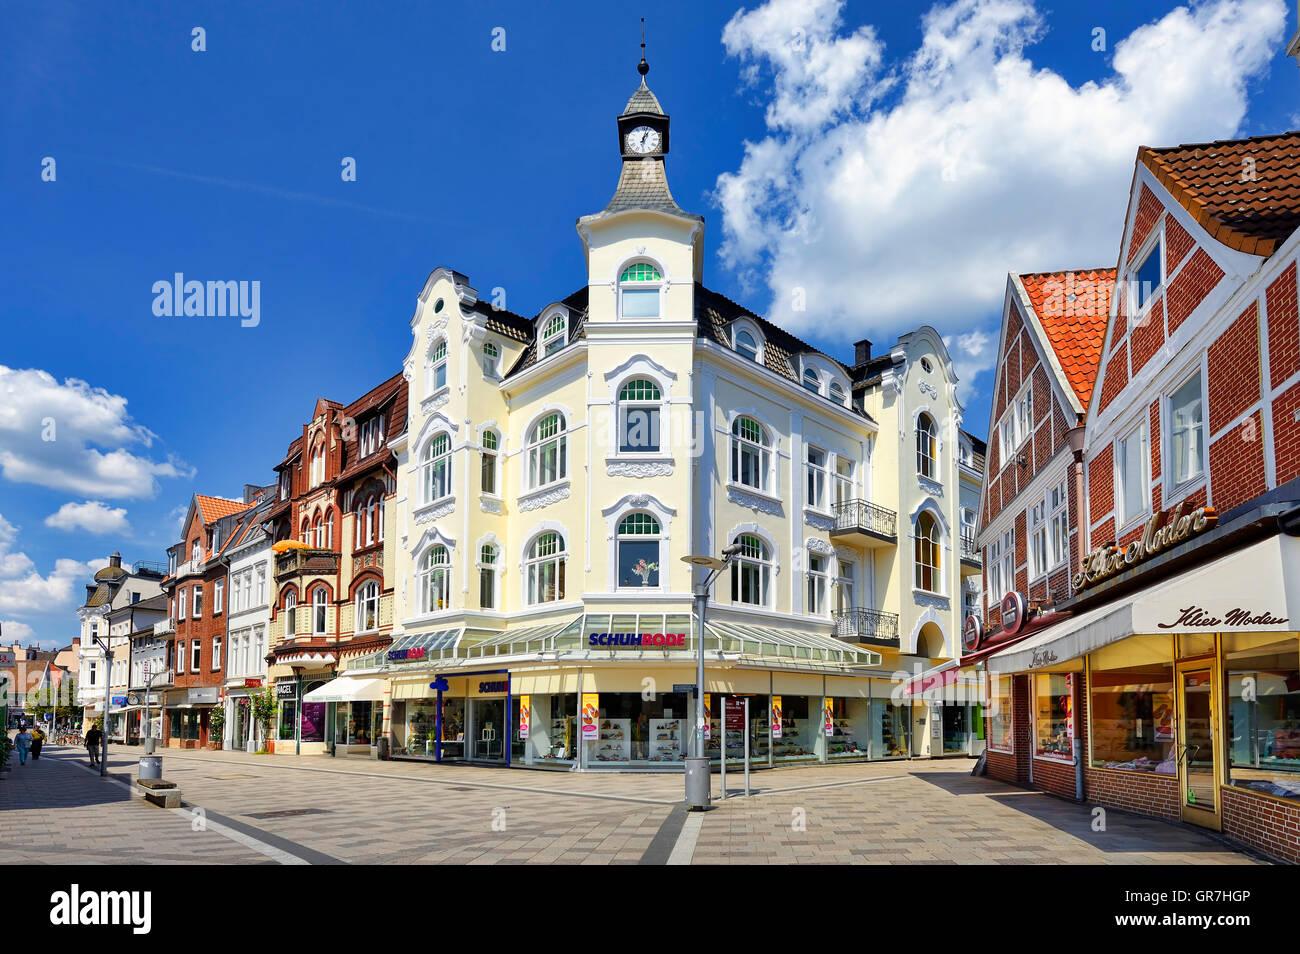 Shopping District Sachsentor In Bergedorf, Hamburg, Germany - Stock Image